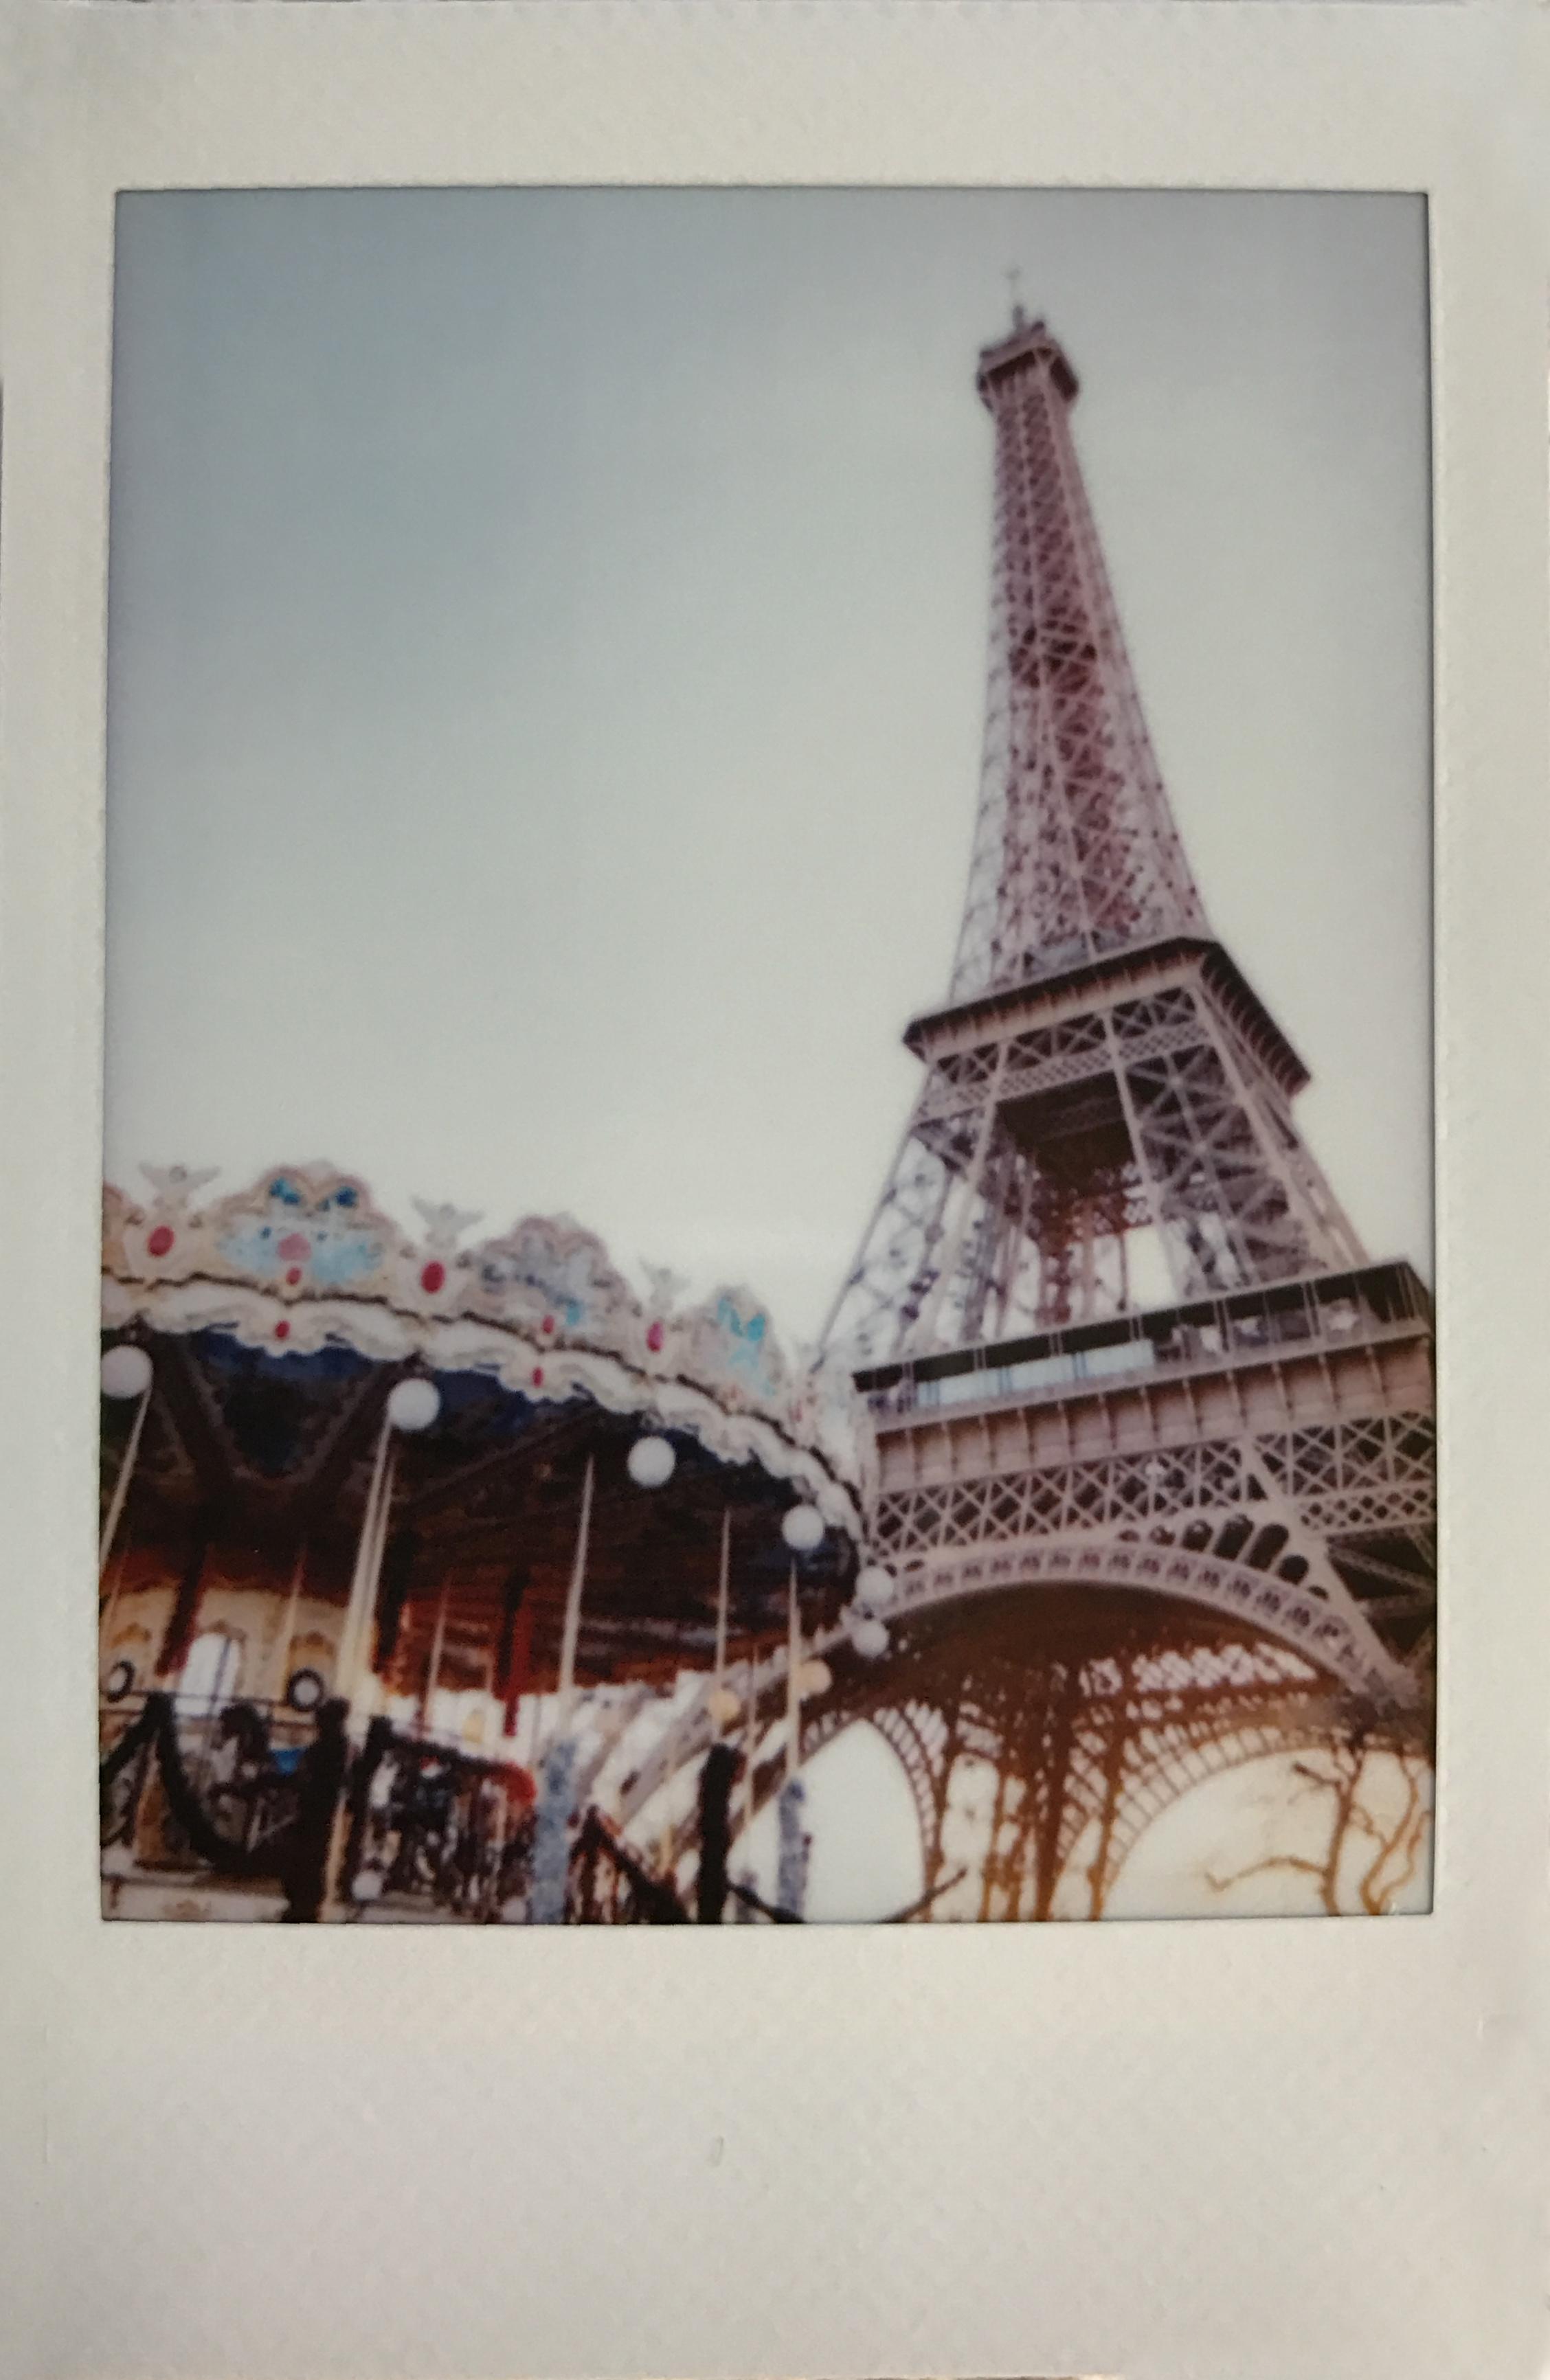 Eiffel Tower Carousel Polaroid by Ashley Goodwin.JPG